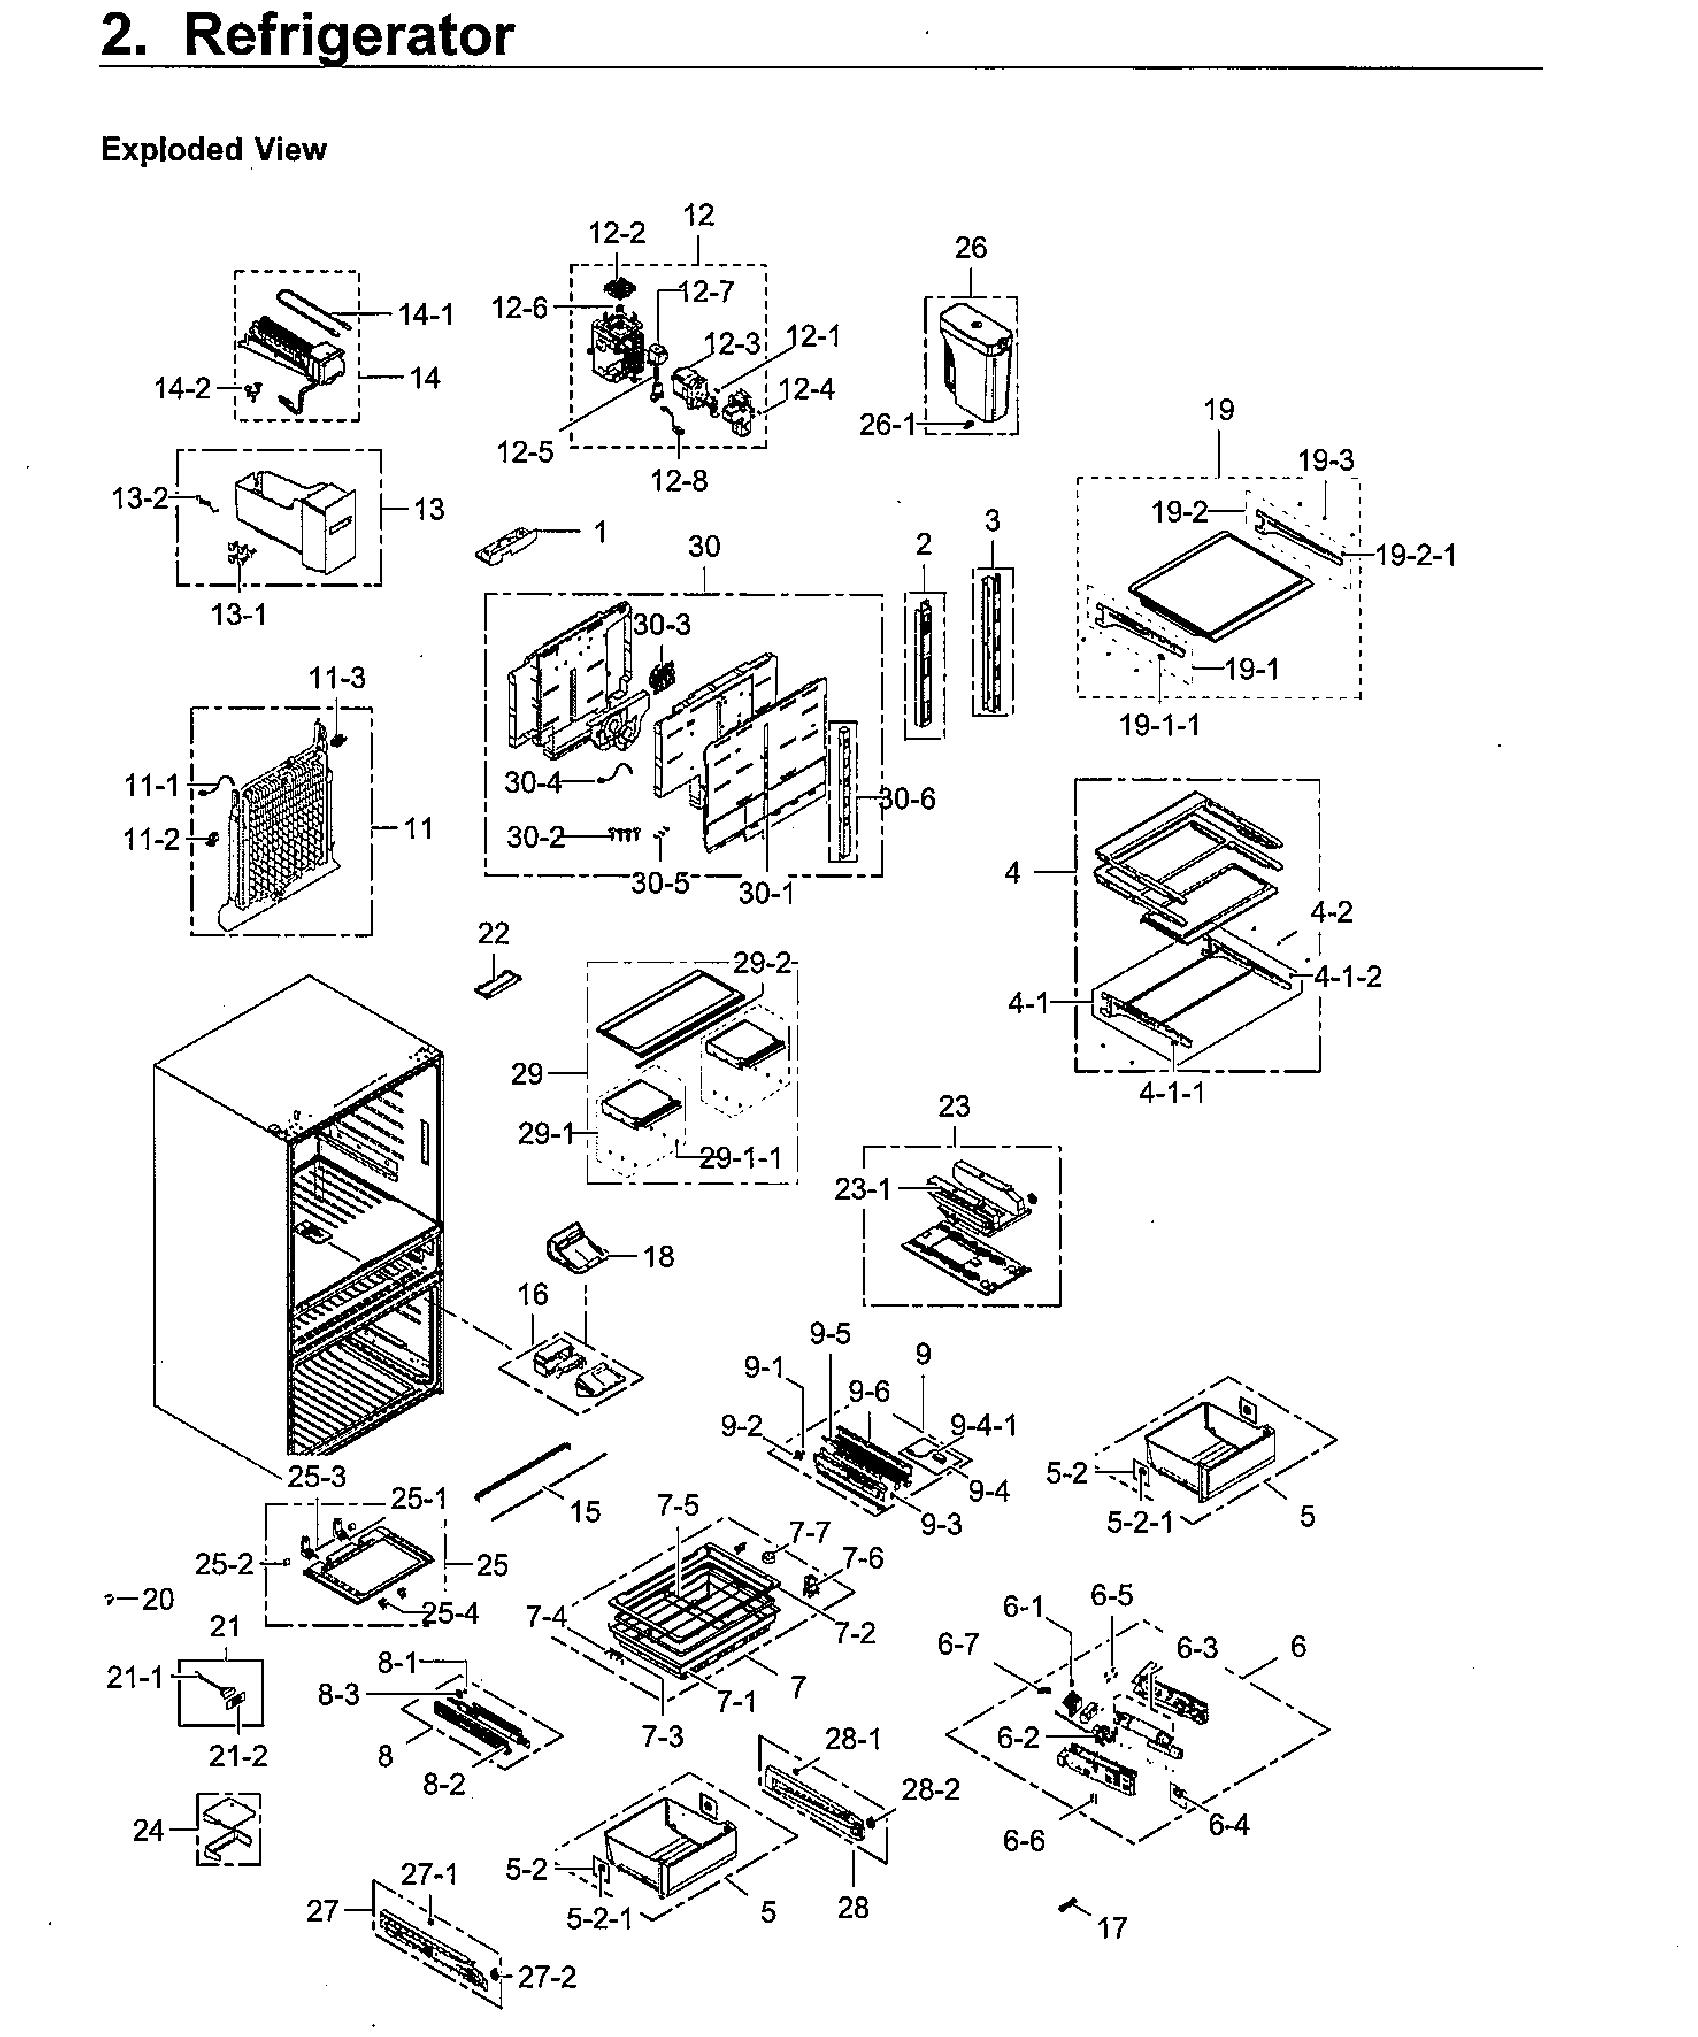 Samsung model RF23M8070SR/AA-00 bottom-mount refrigerator